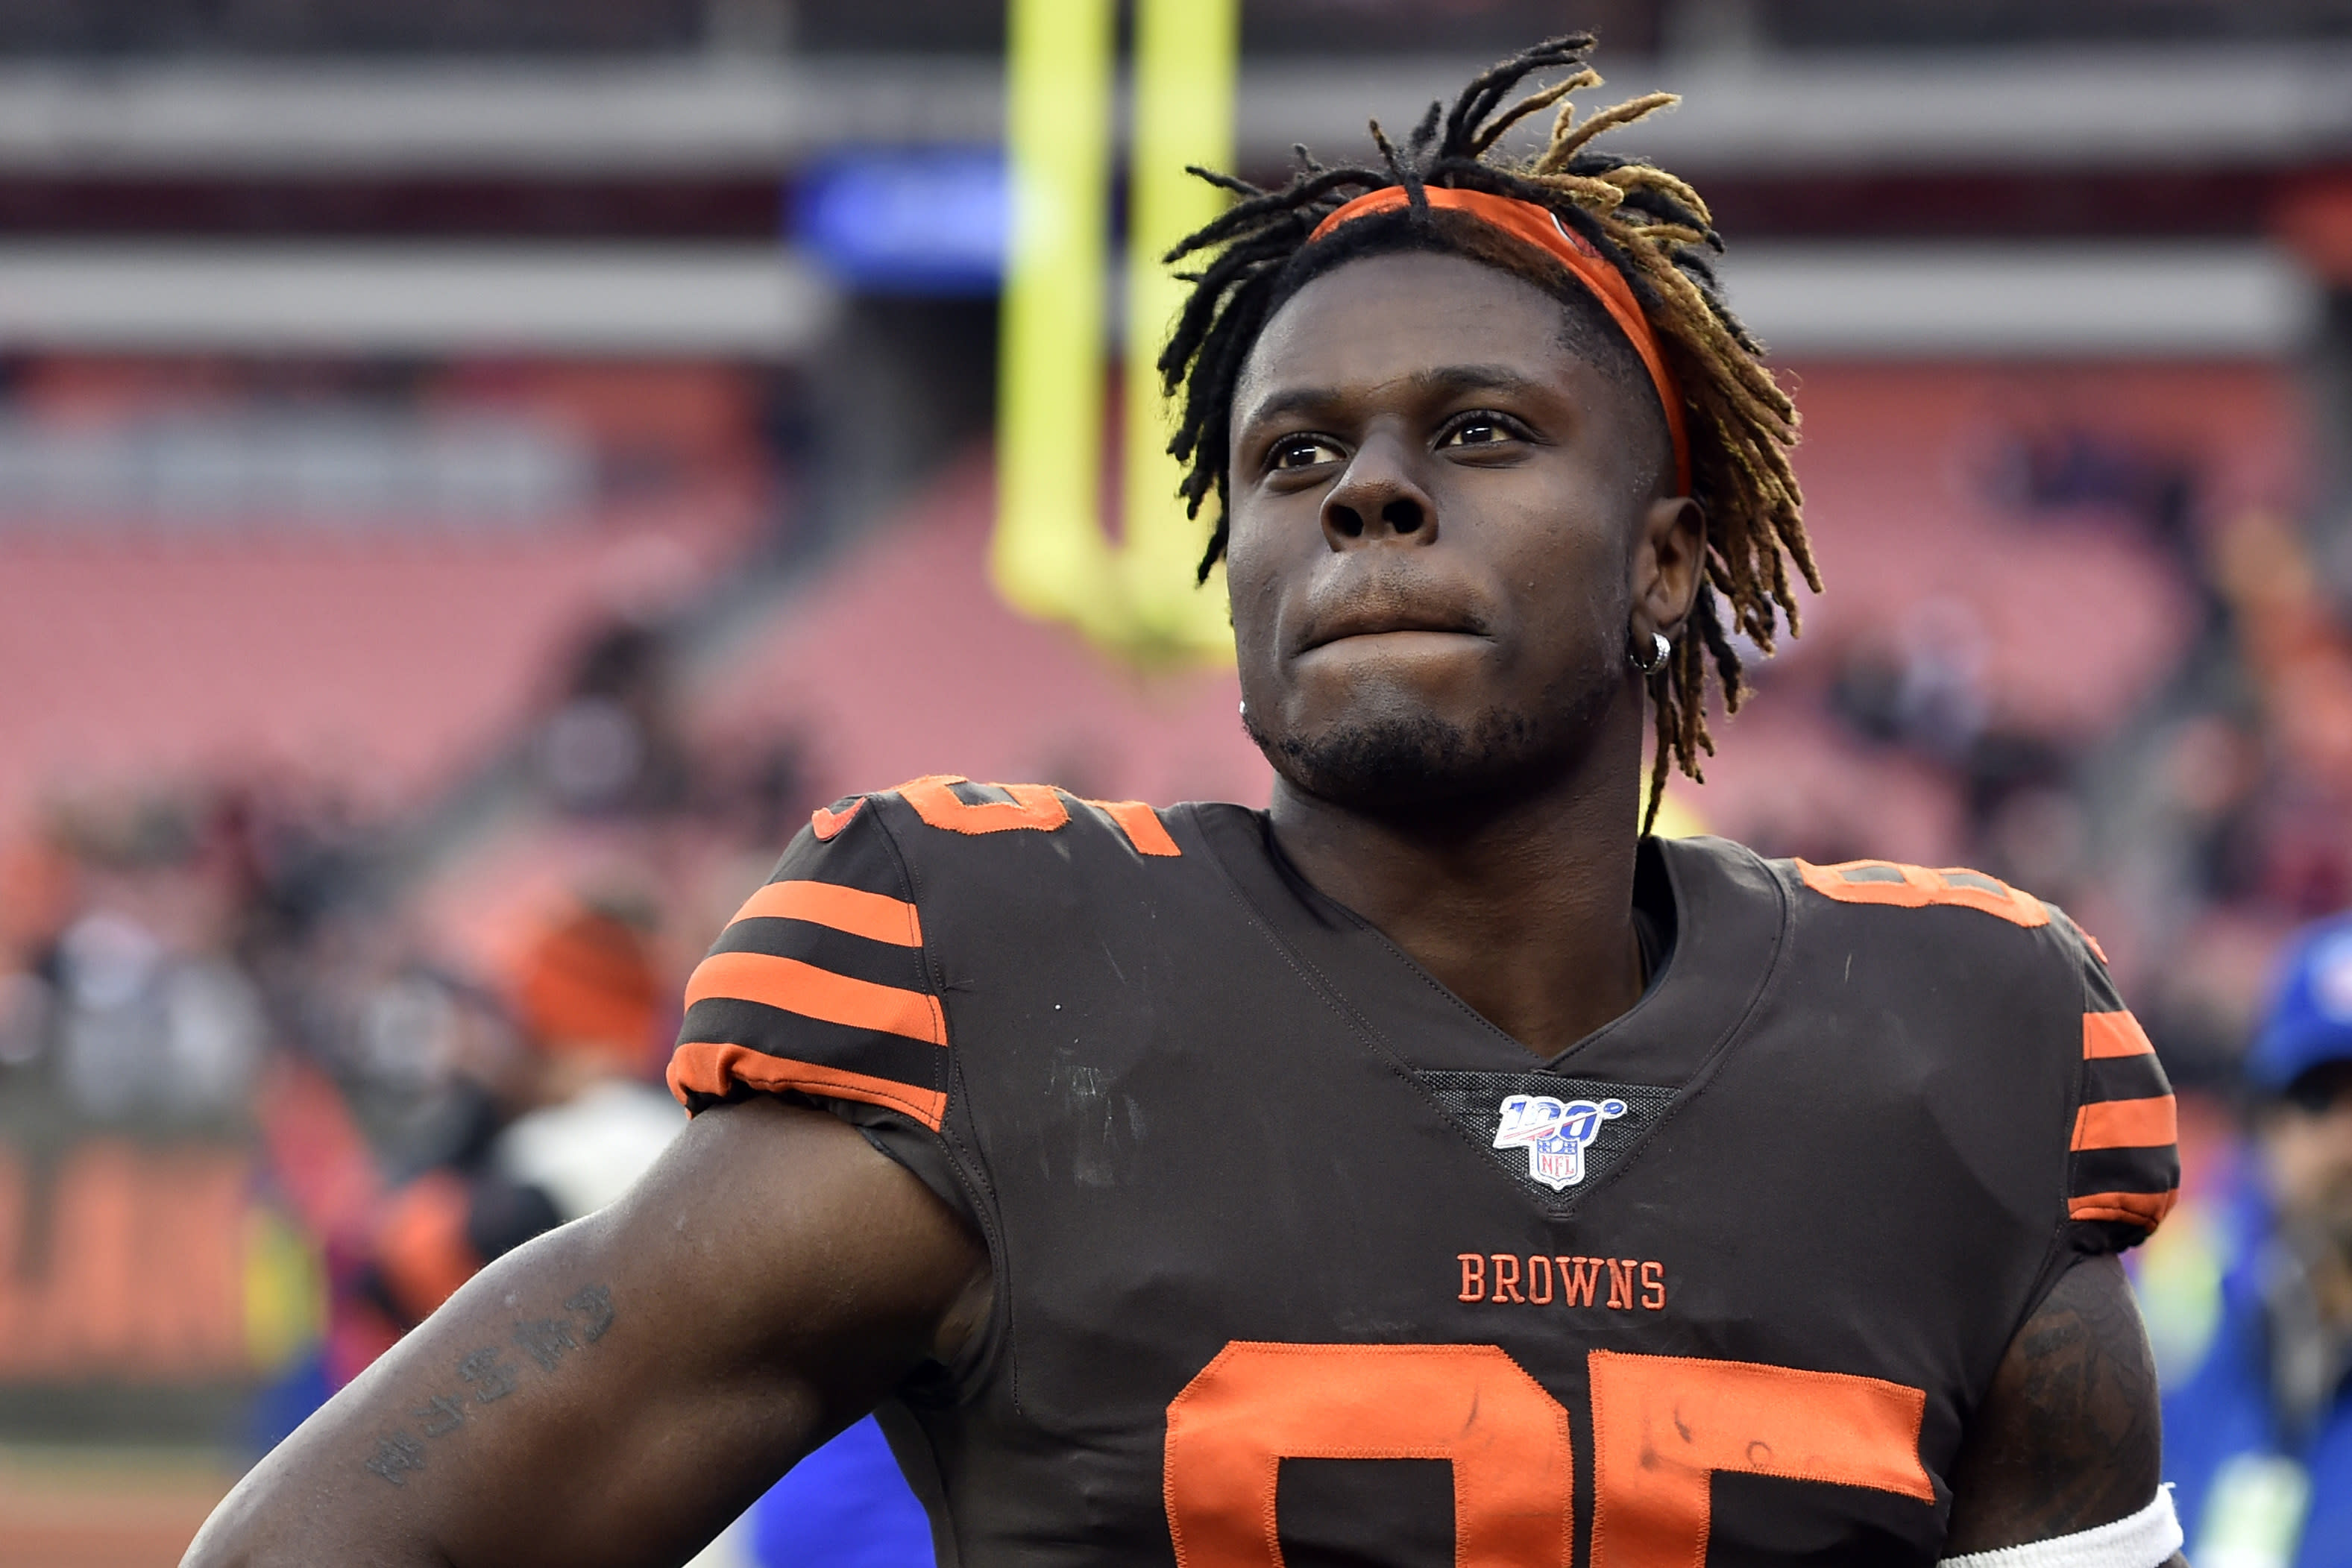 Browns-Njoku Football